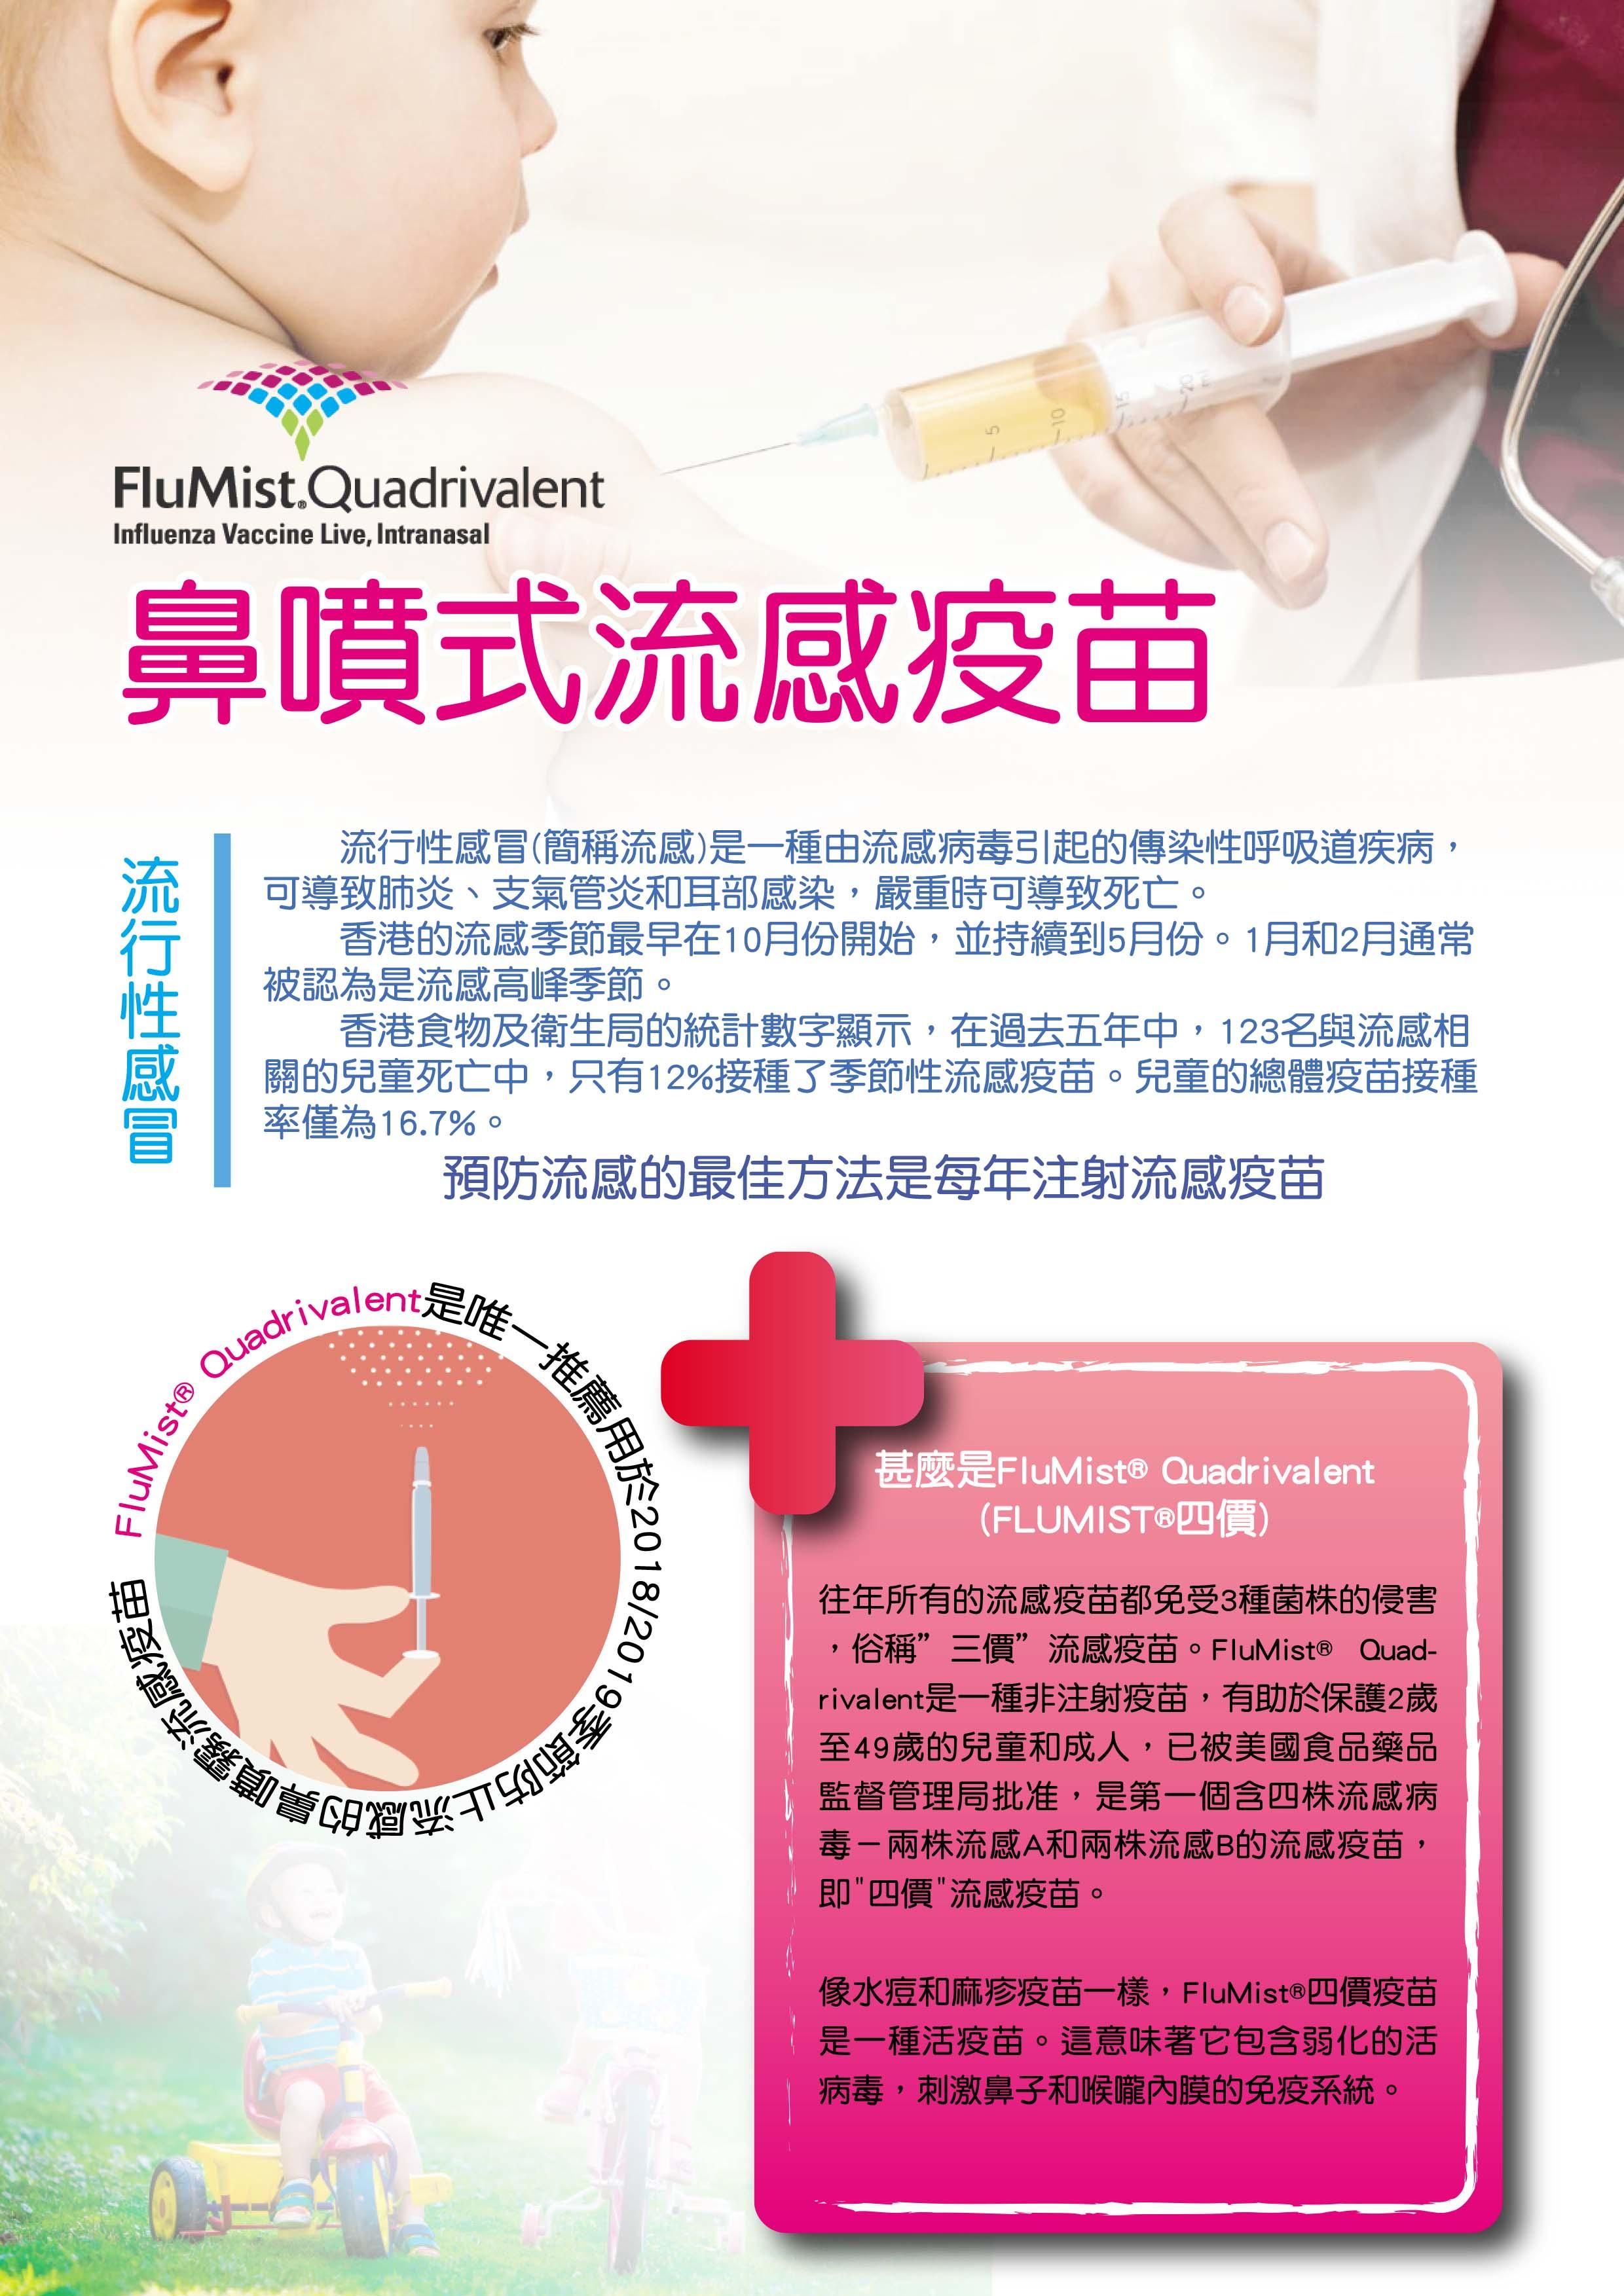 flumist-quadrivalent-influenza-vaccine-live-instranasal-2.jpg